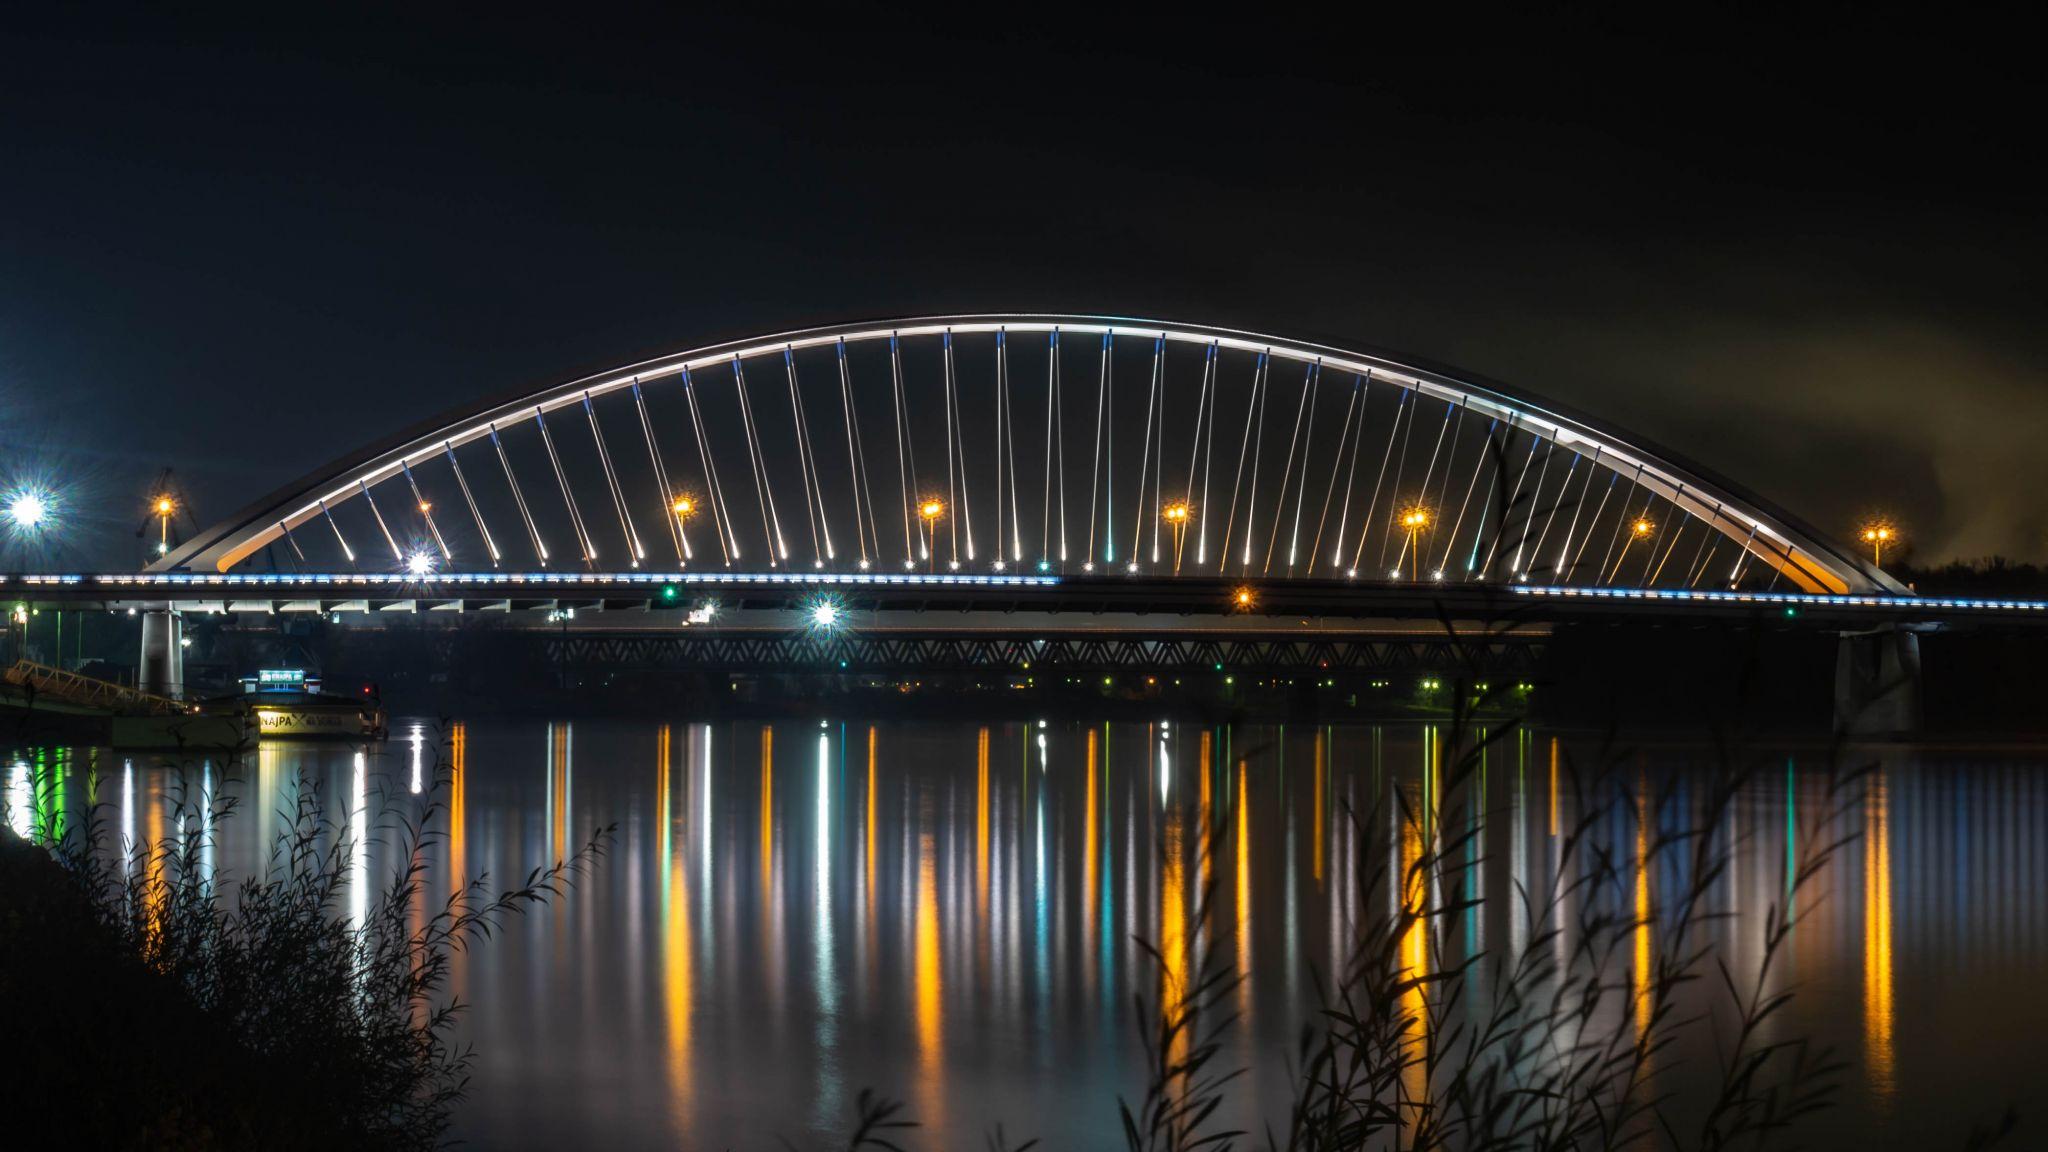 Light of the night, Slovakia (Slovak Republic)